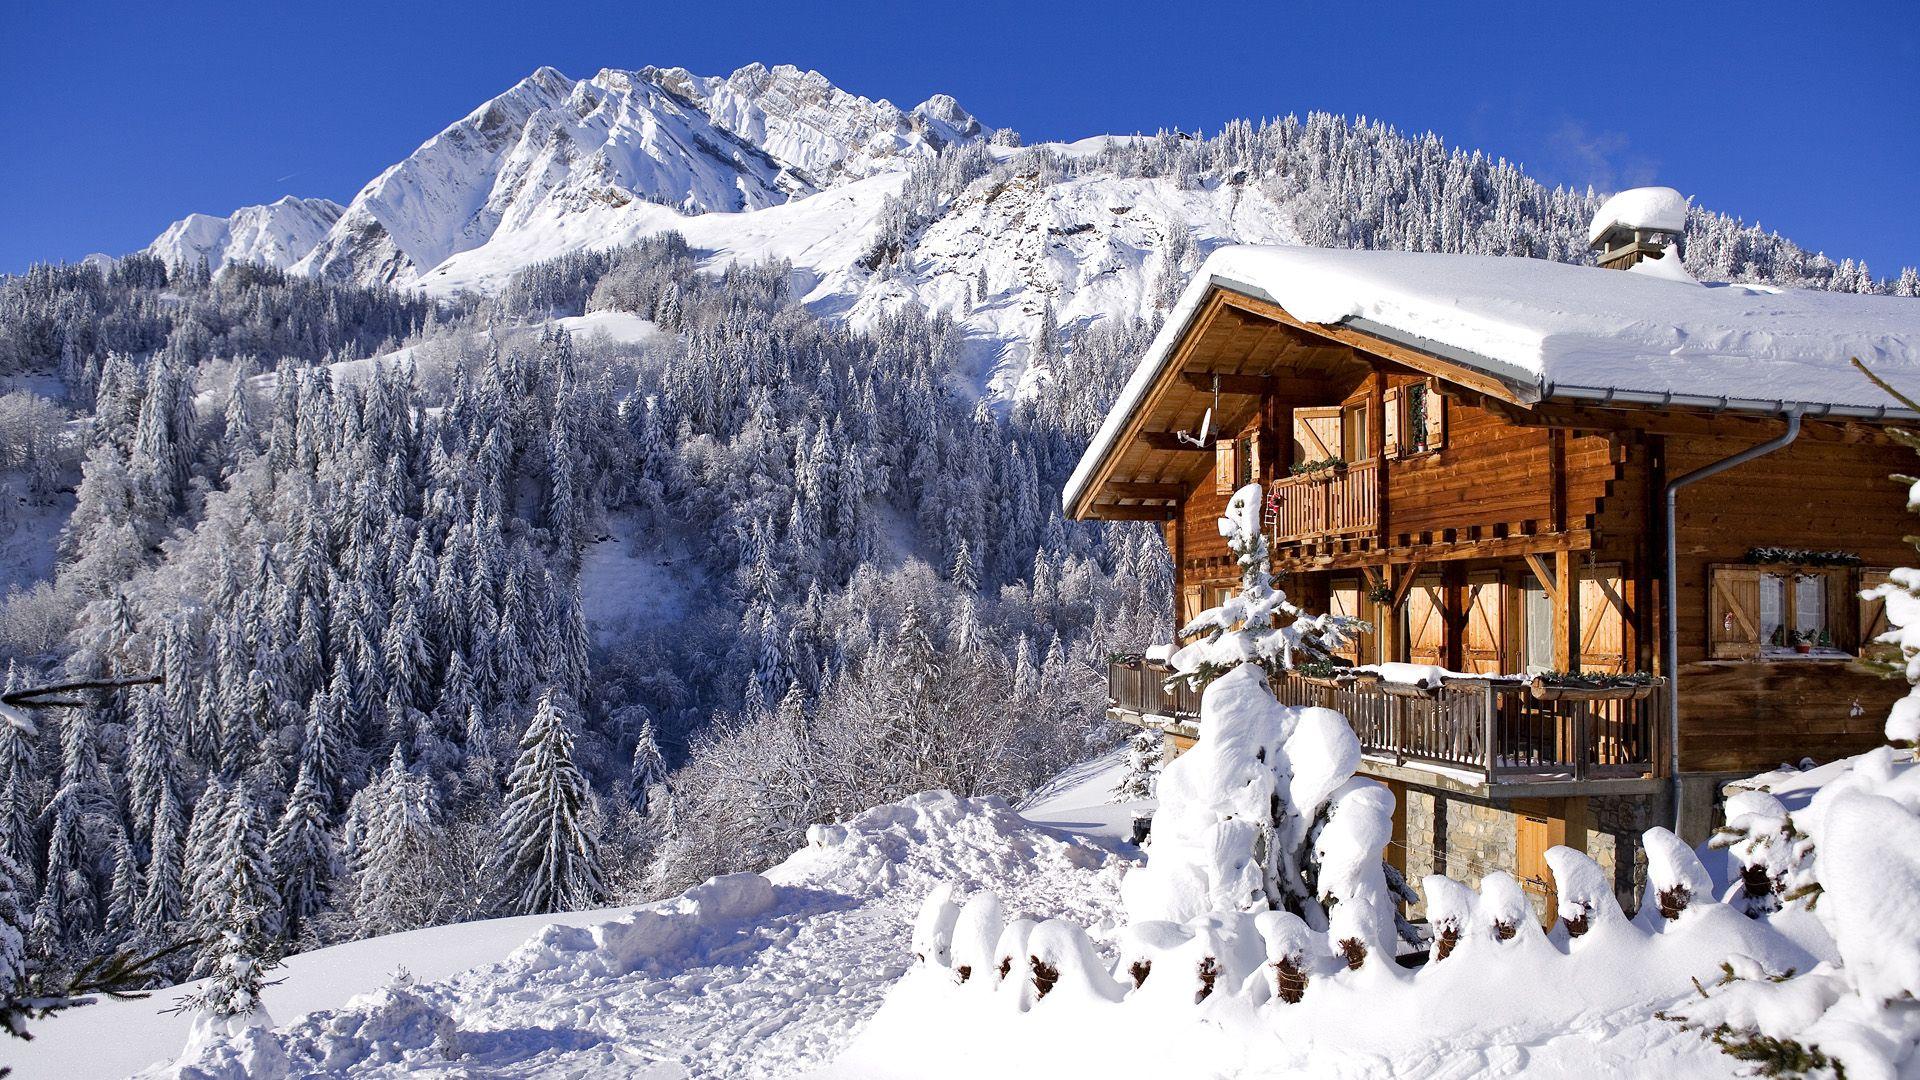 Chalet In Swiss Alps